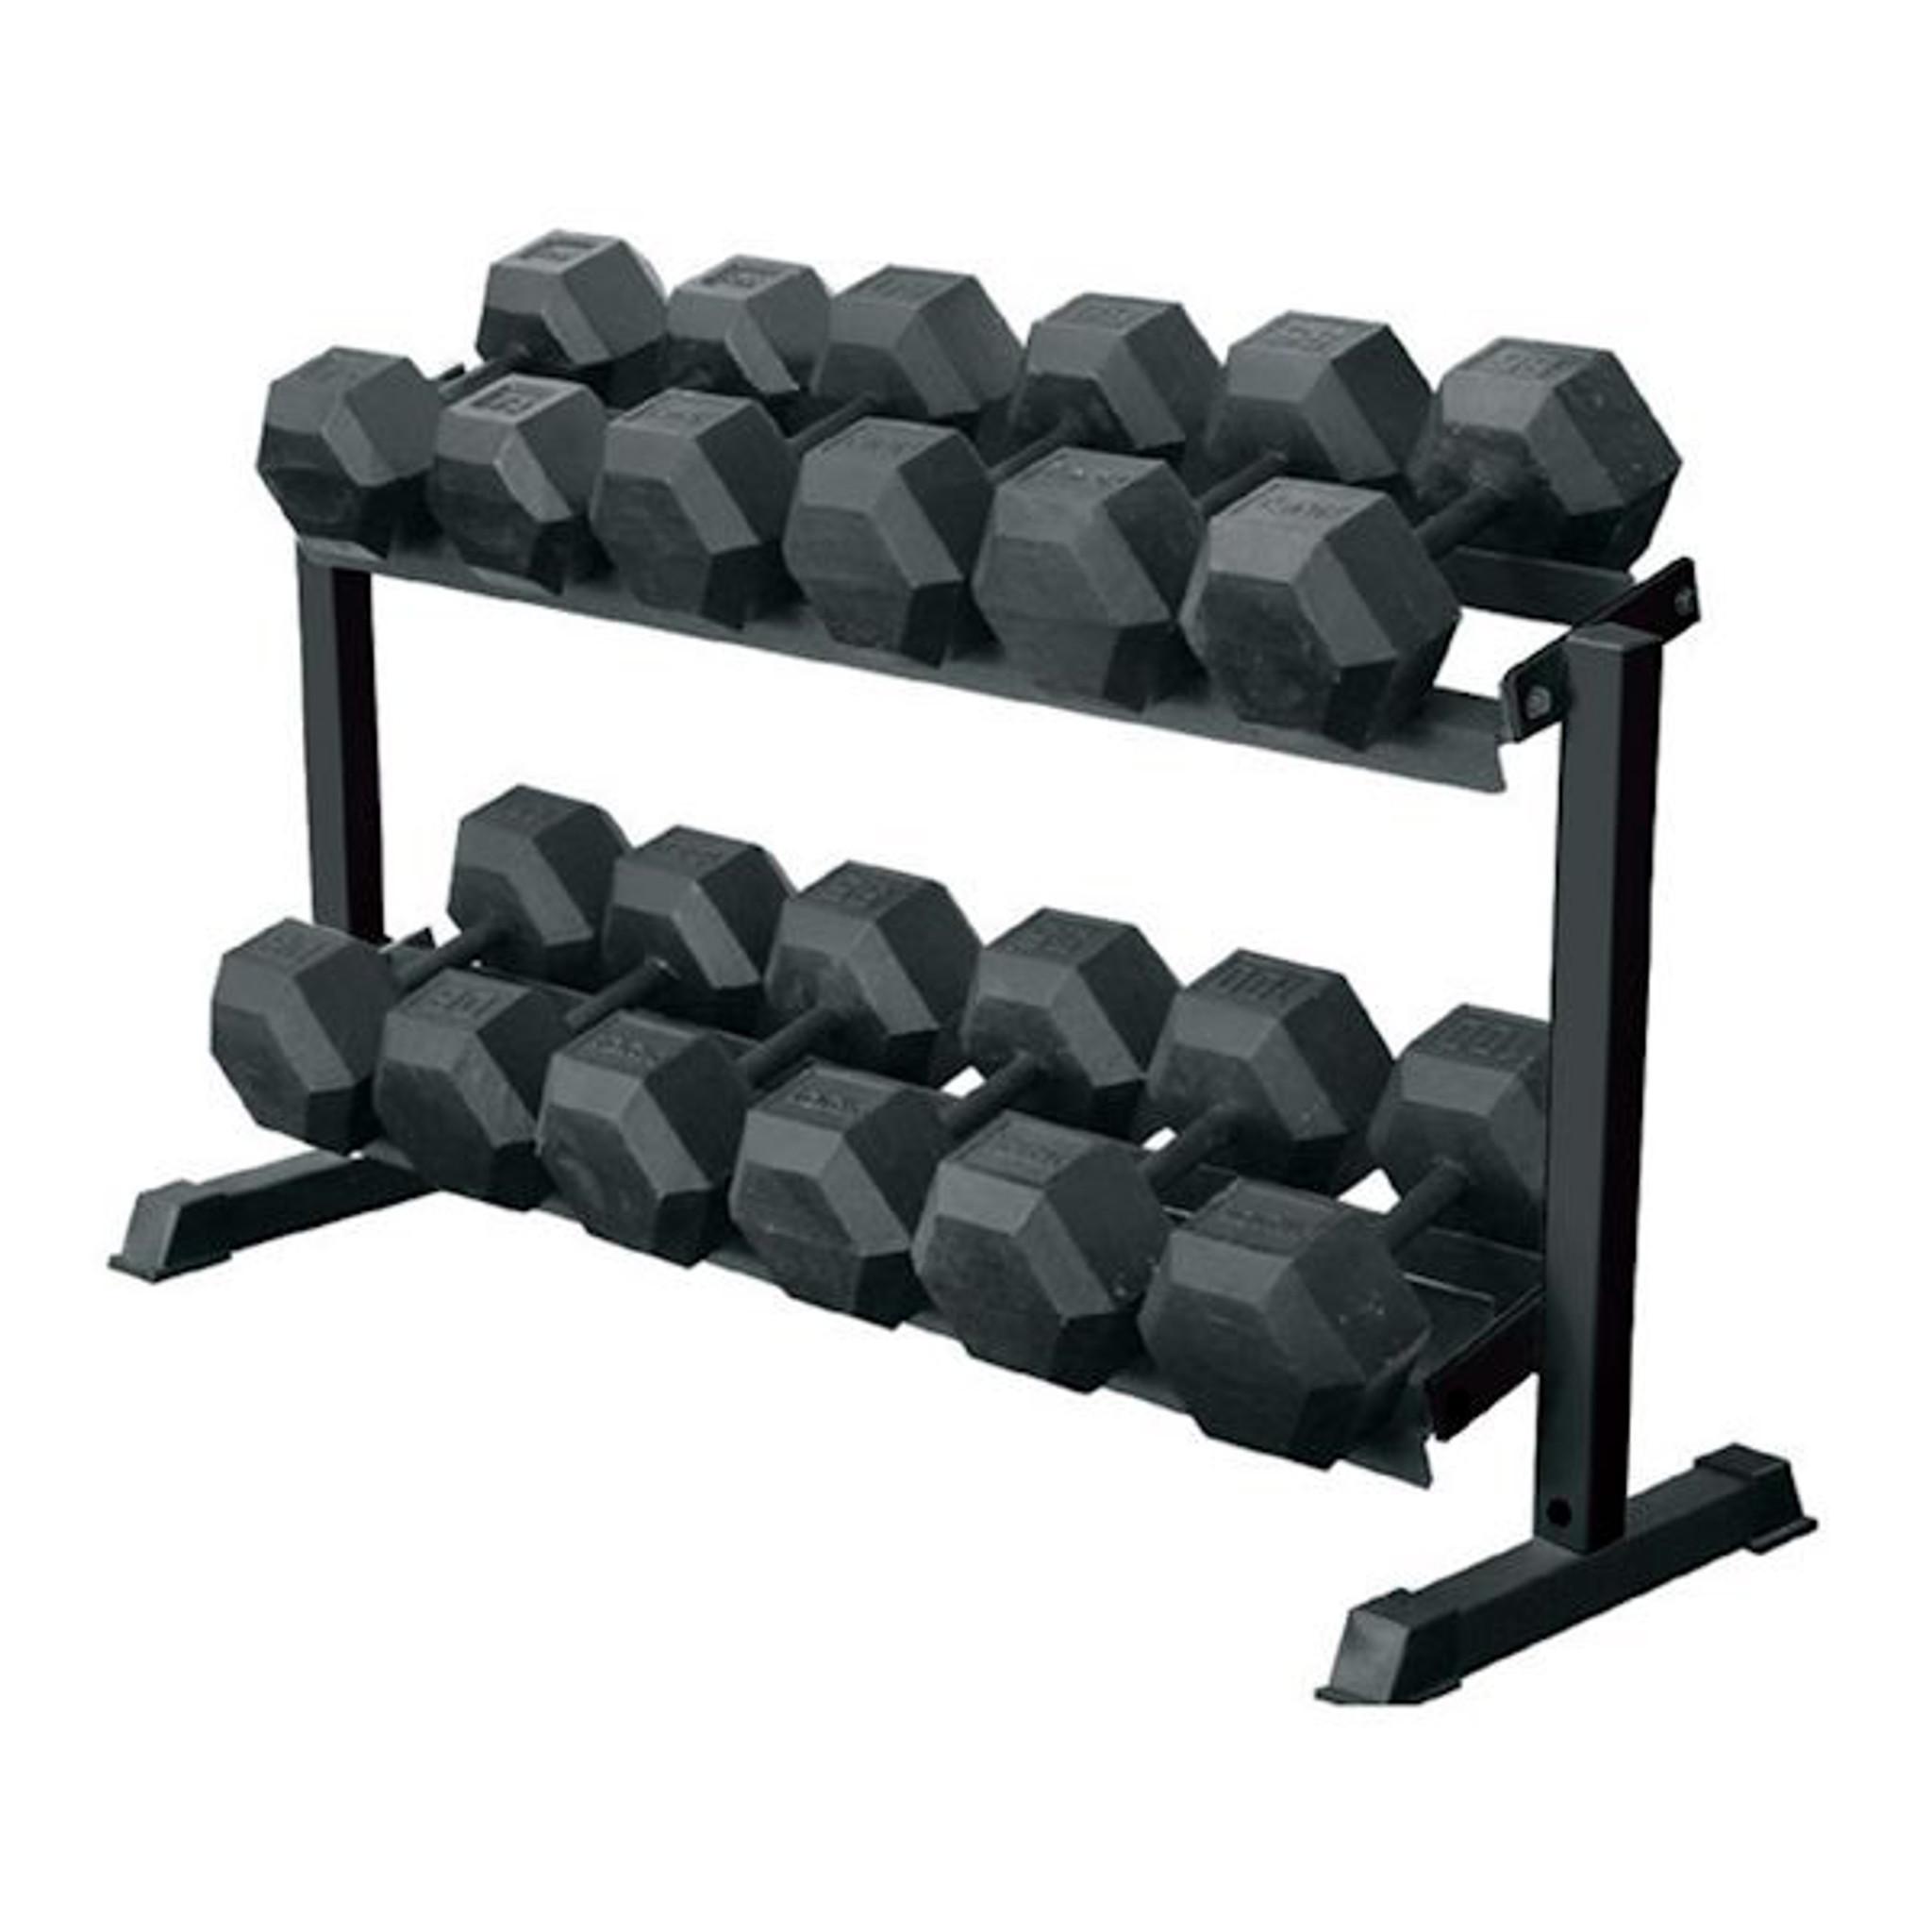 69126 2 Tier Pro Hex Dumbbell Rack York Gtech Fitness